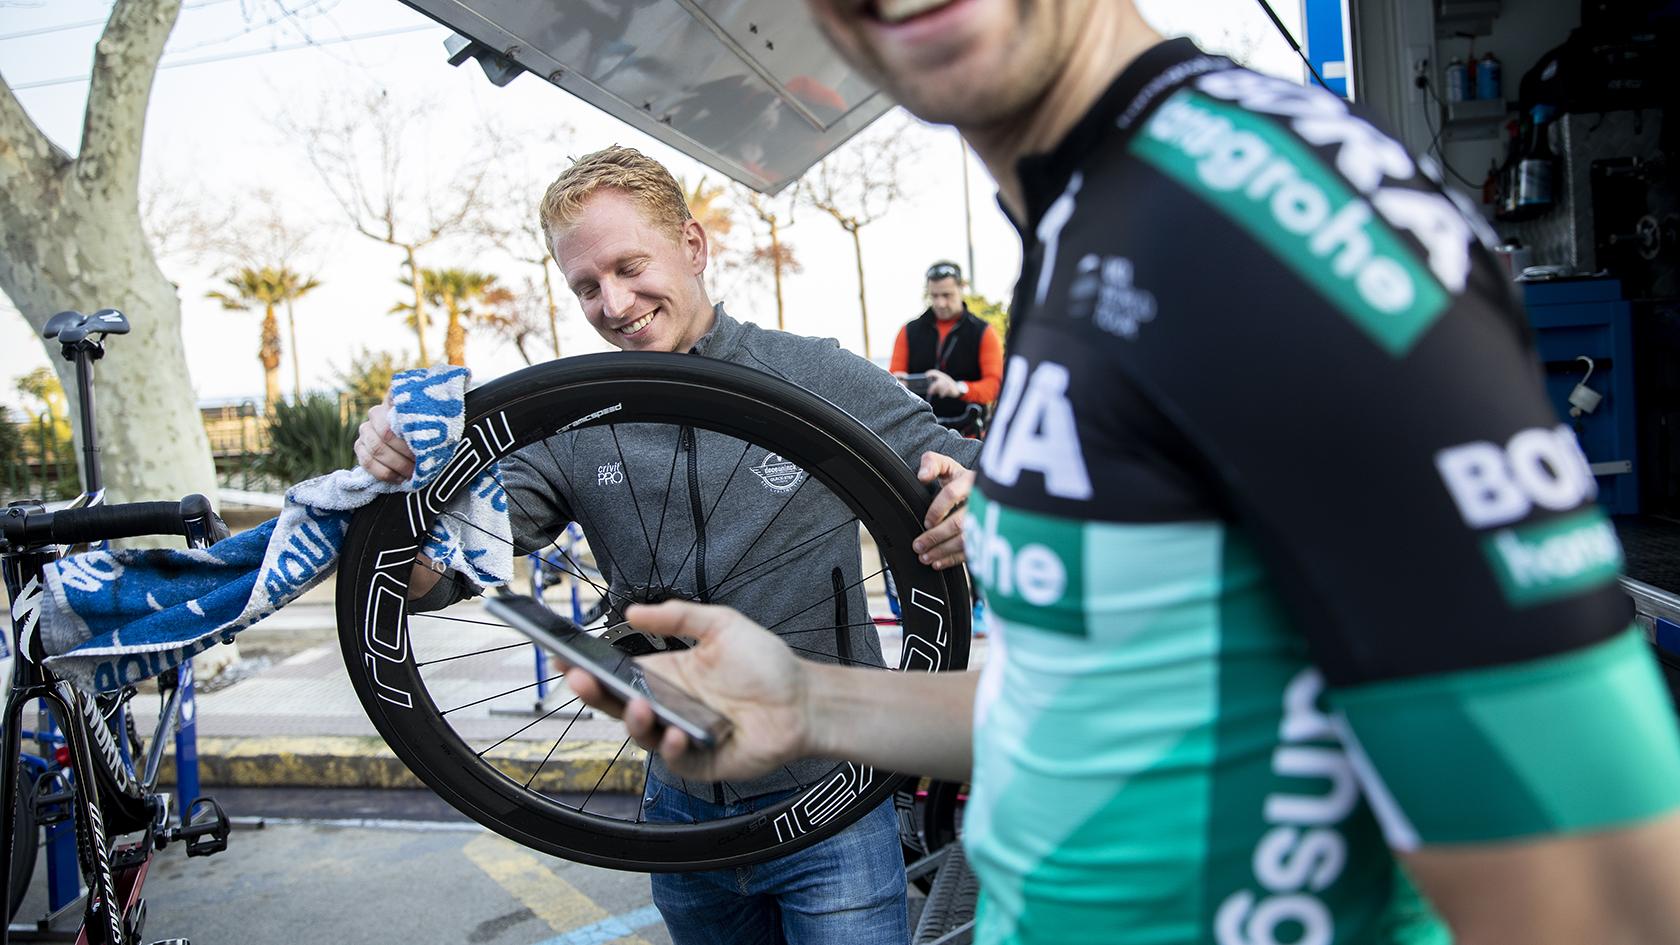 Under etapen kørte den ene servicebil fra Deceuninck-Quick Step ind i en bil fra et andet hold, hvilket cykelrytteren Maximillian Schachmann kommer over til Rune Kristensen og joker lidt med. Selvom de ikke tilhører samme hold.